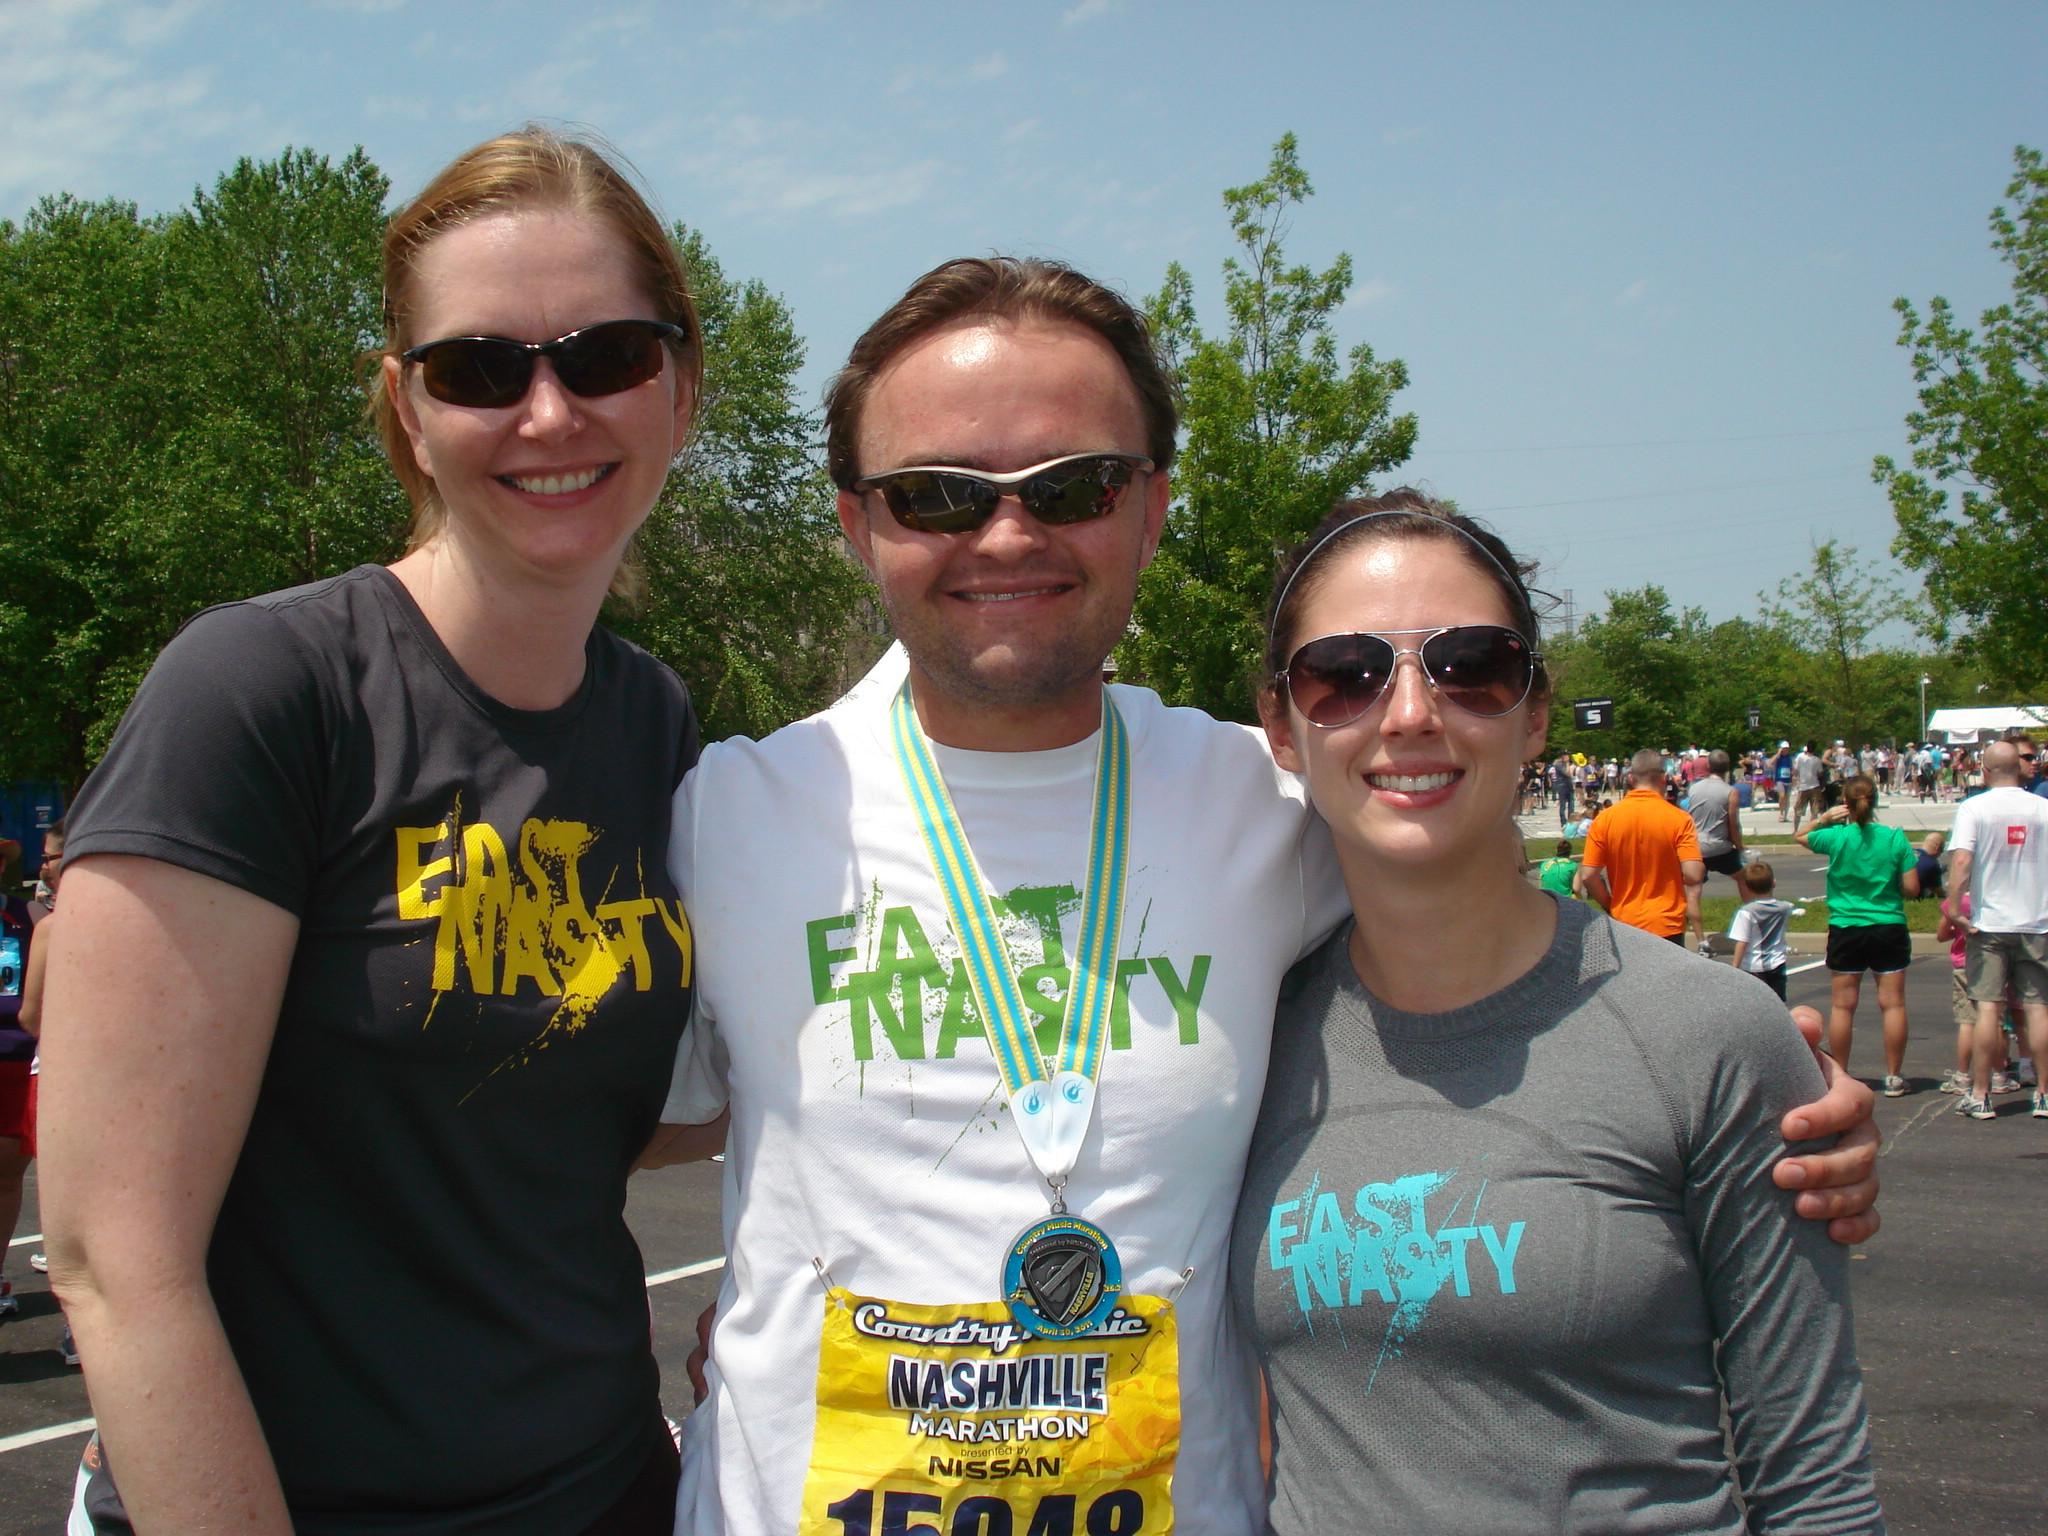 First Marathon, 2011 Country Music